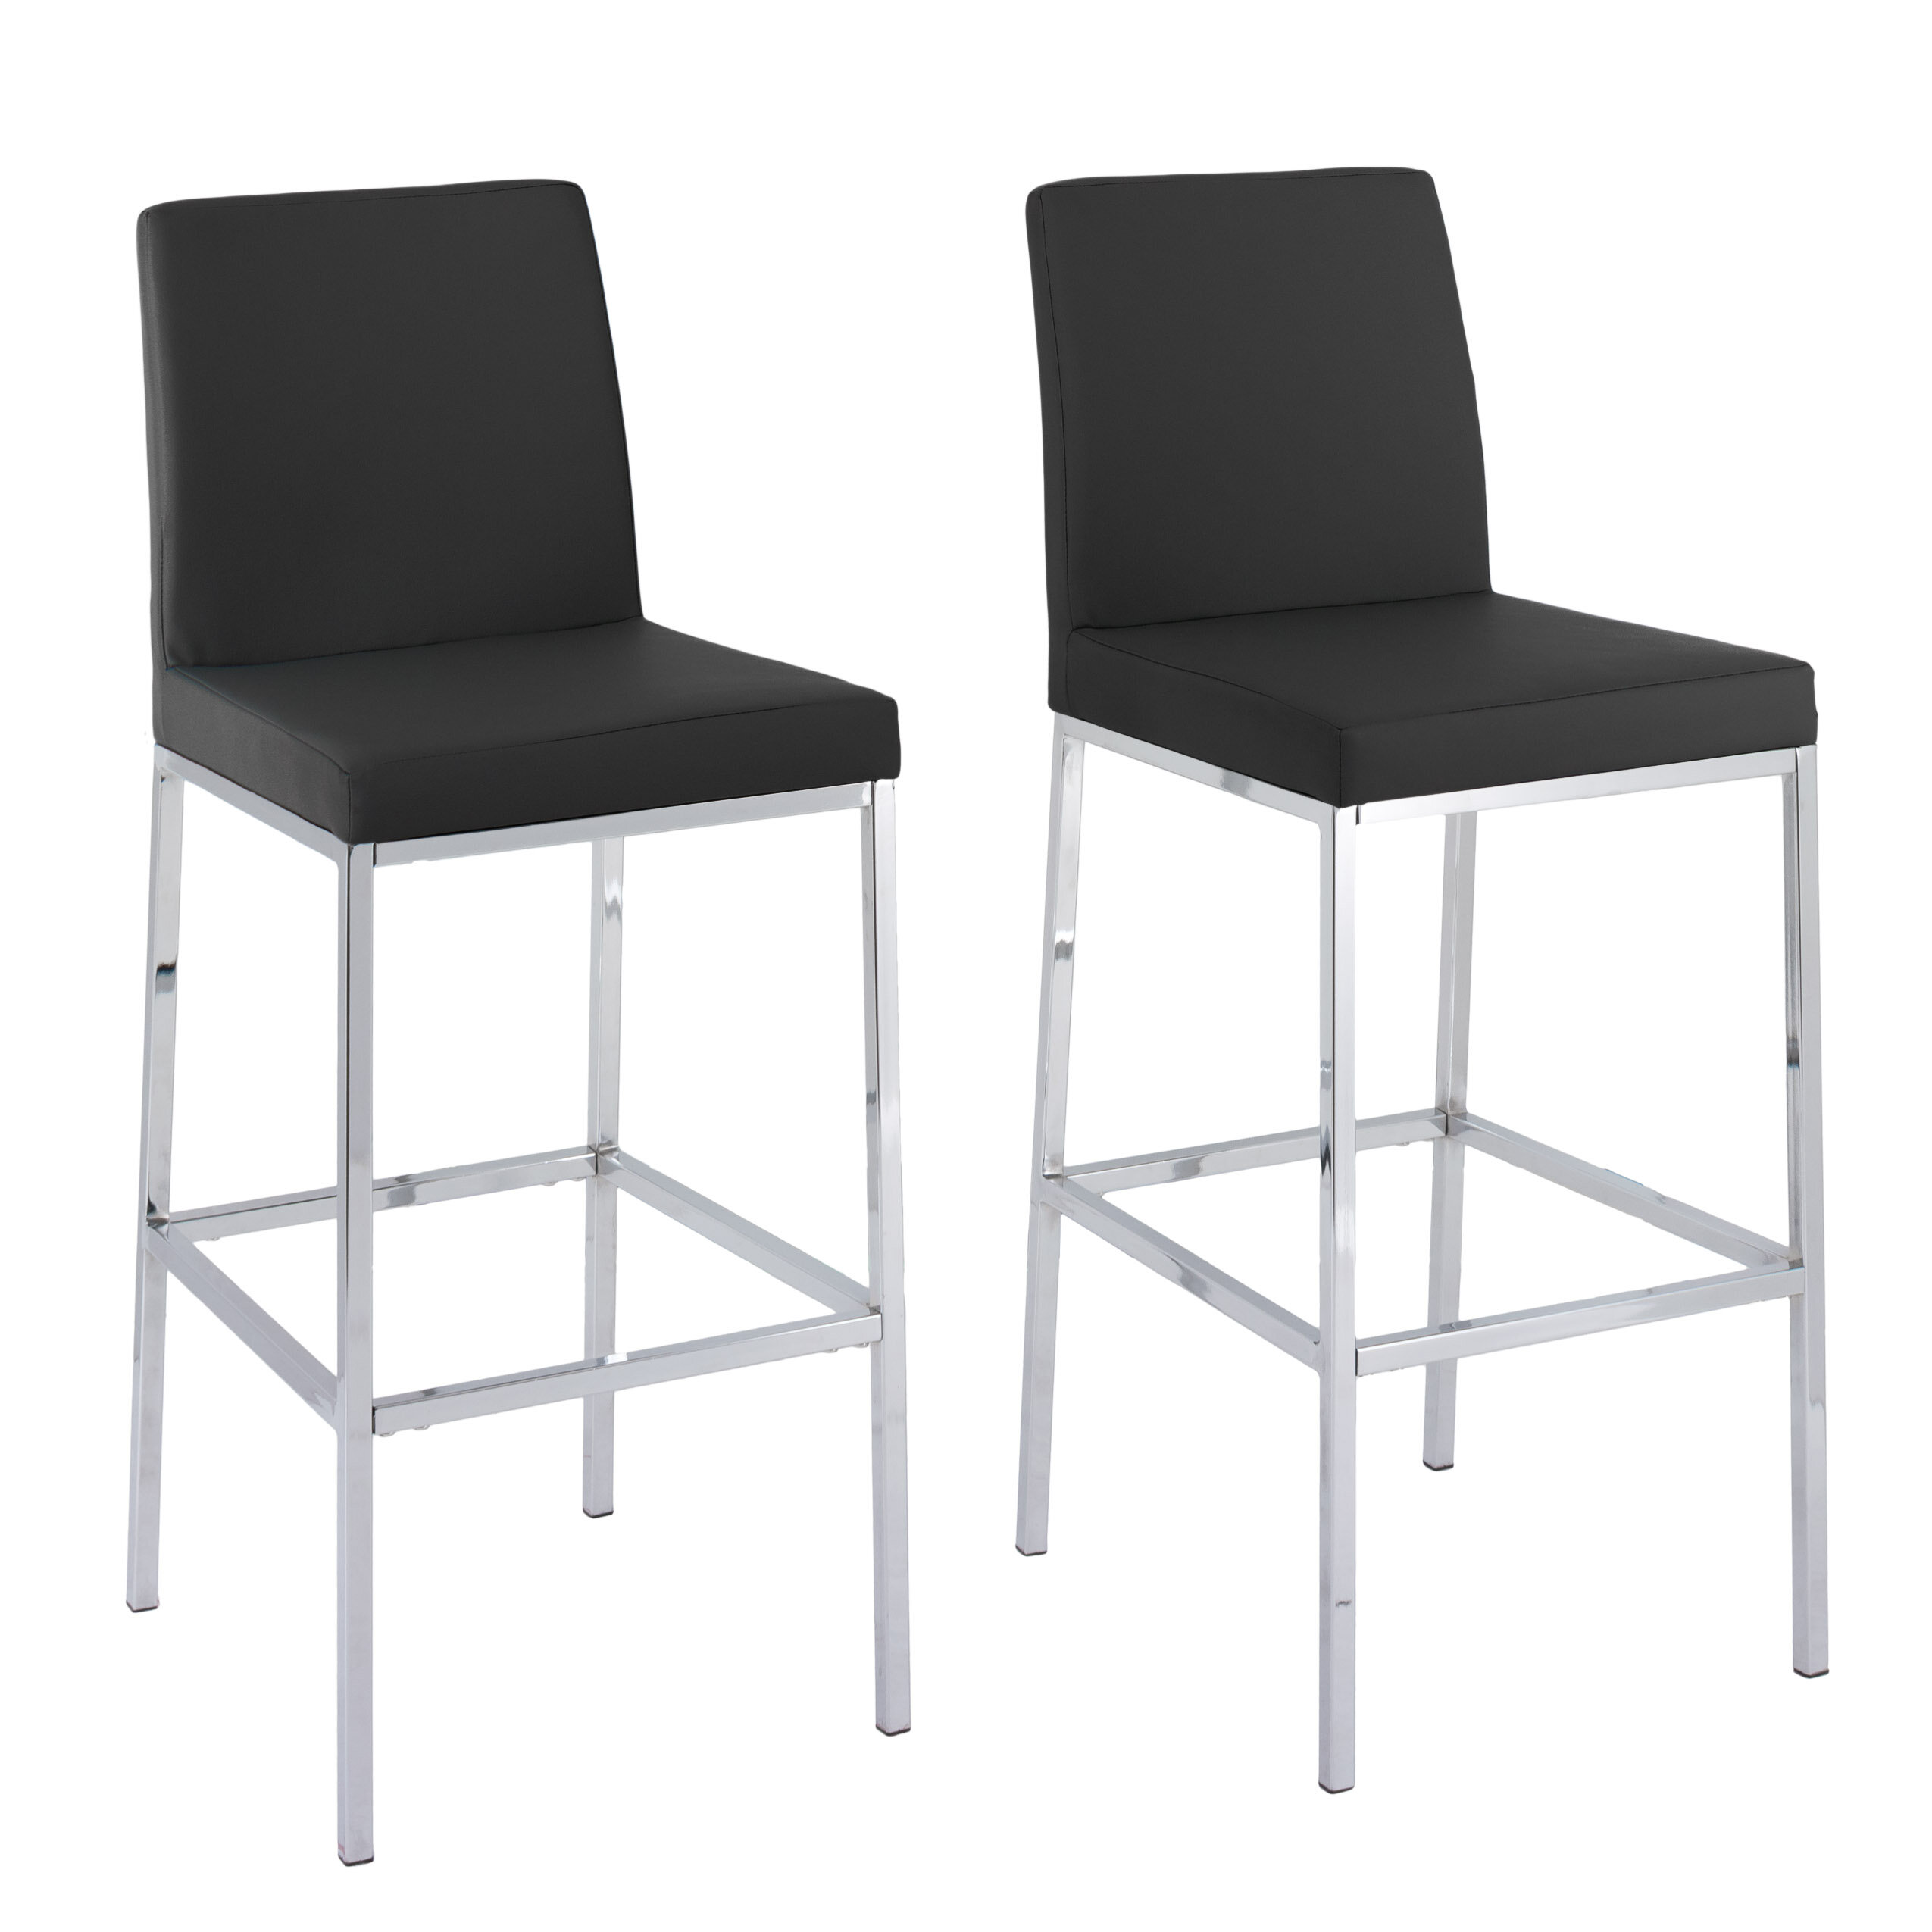 Orren ellis onya contemporary bar stool reviews wayfair